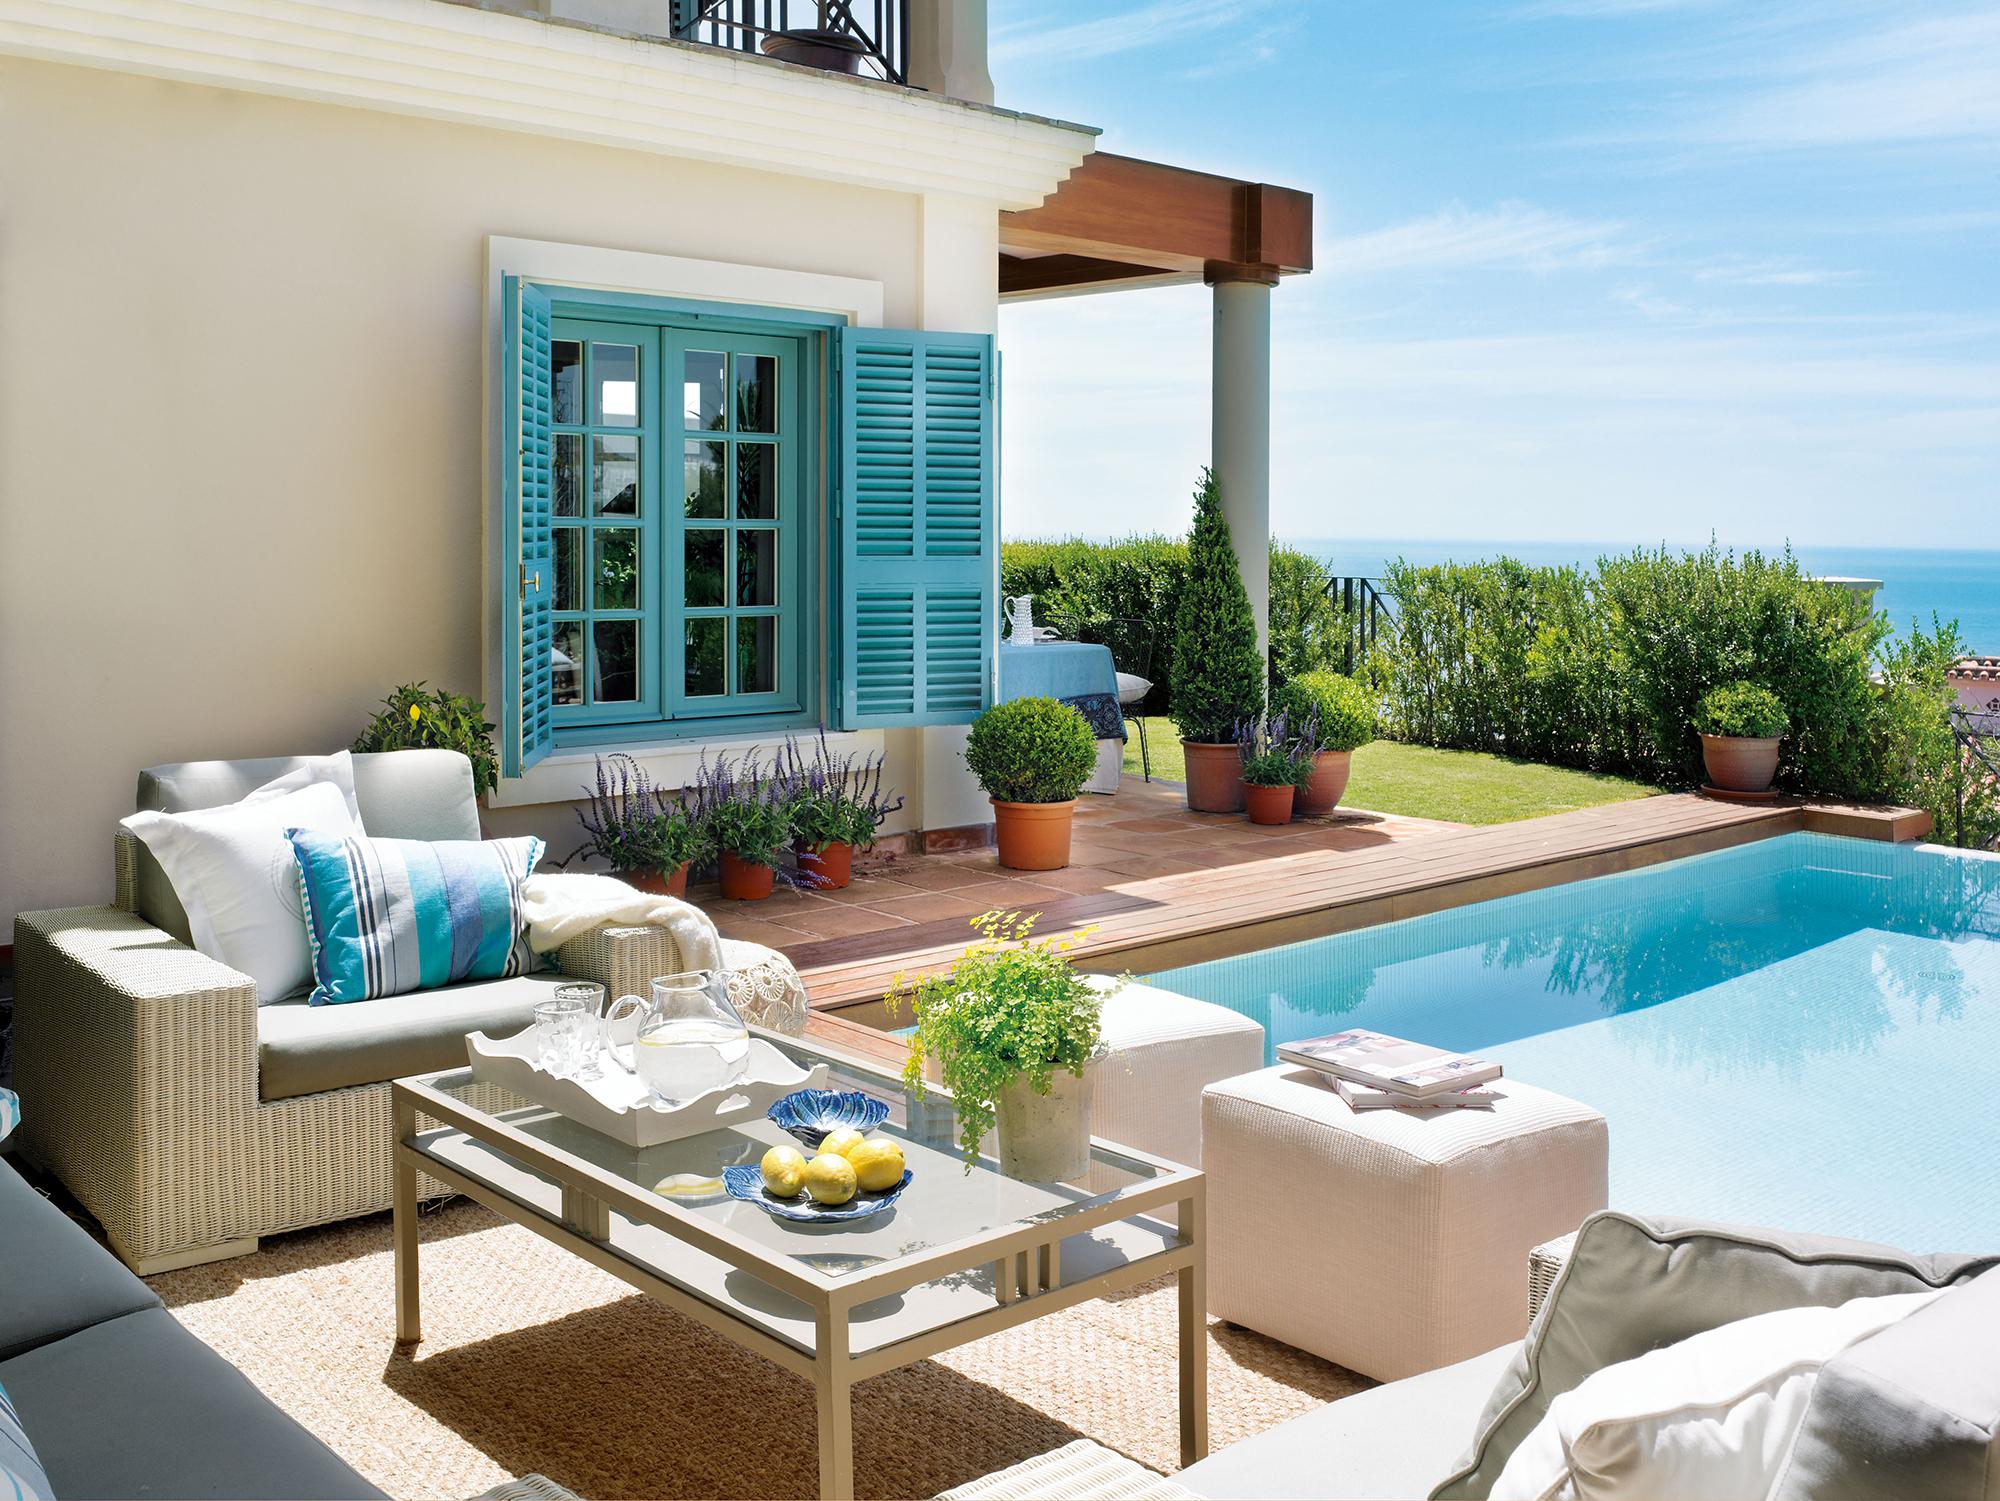 Terrazas muebles mesas e ideas para tu terraza el mueble - Patios con piscina ...